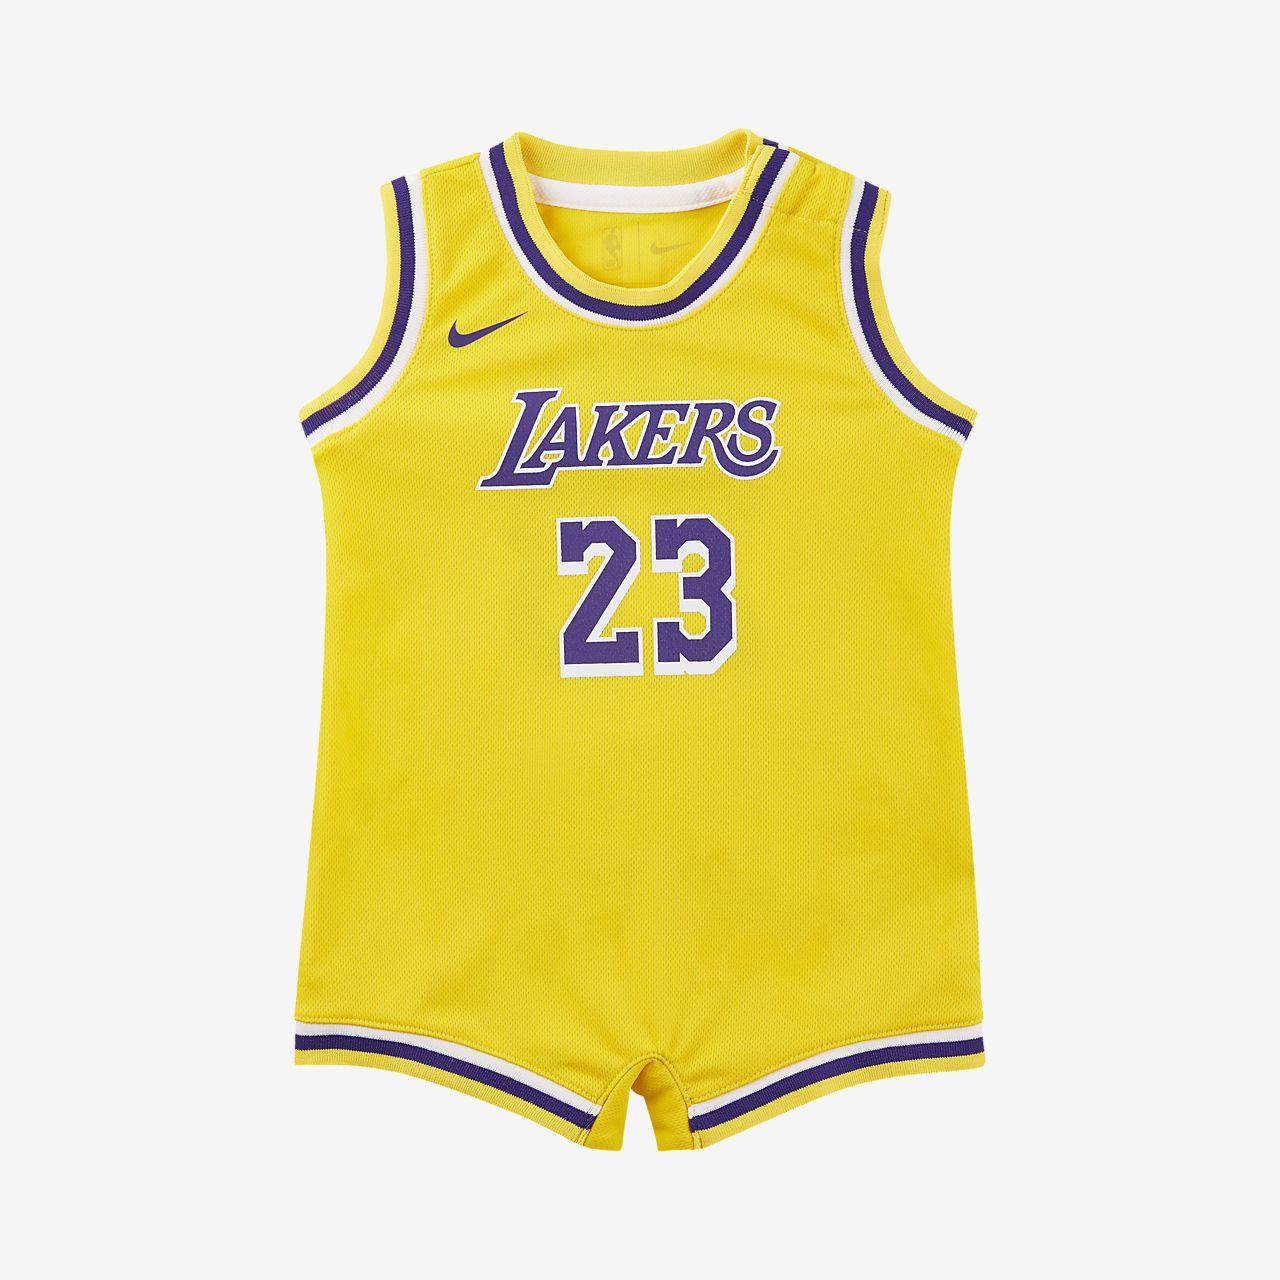 洛杉矶湖人队 Icon Edition Nike NBA婴童连体衣